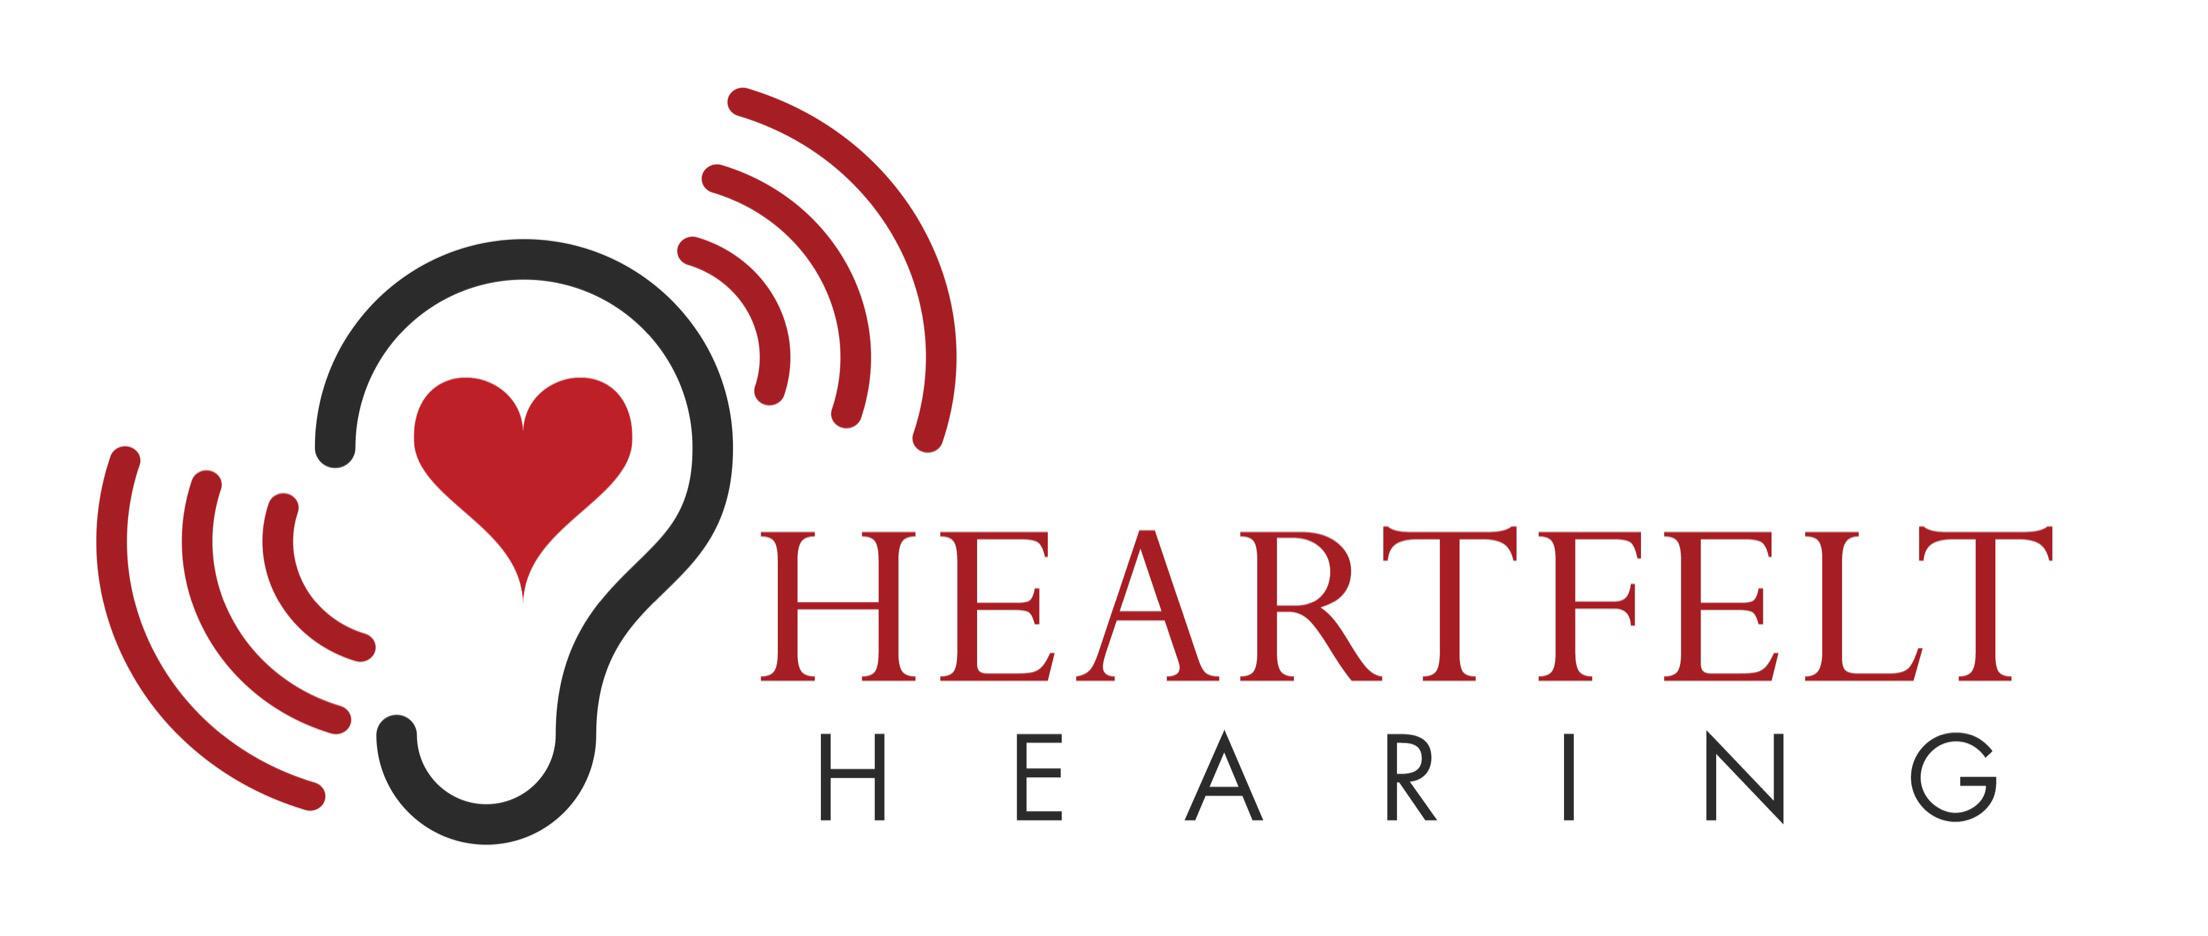 Heartfelt Hearing image 1